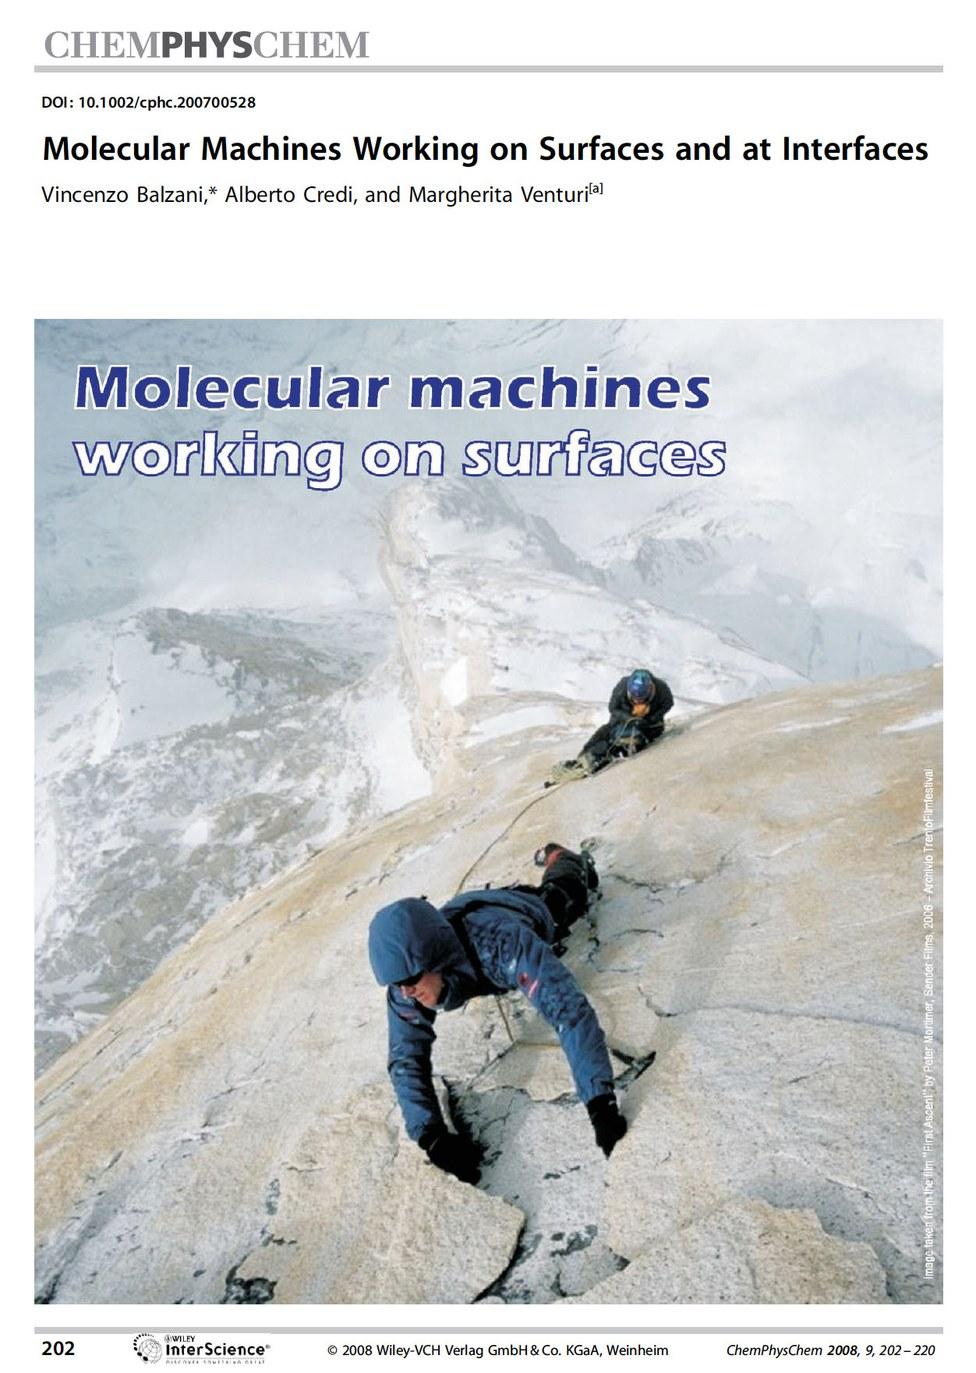 Molecular machines on surfaces